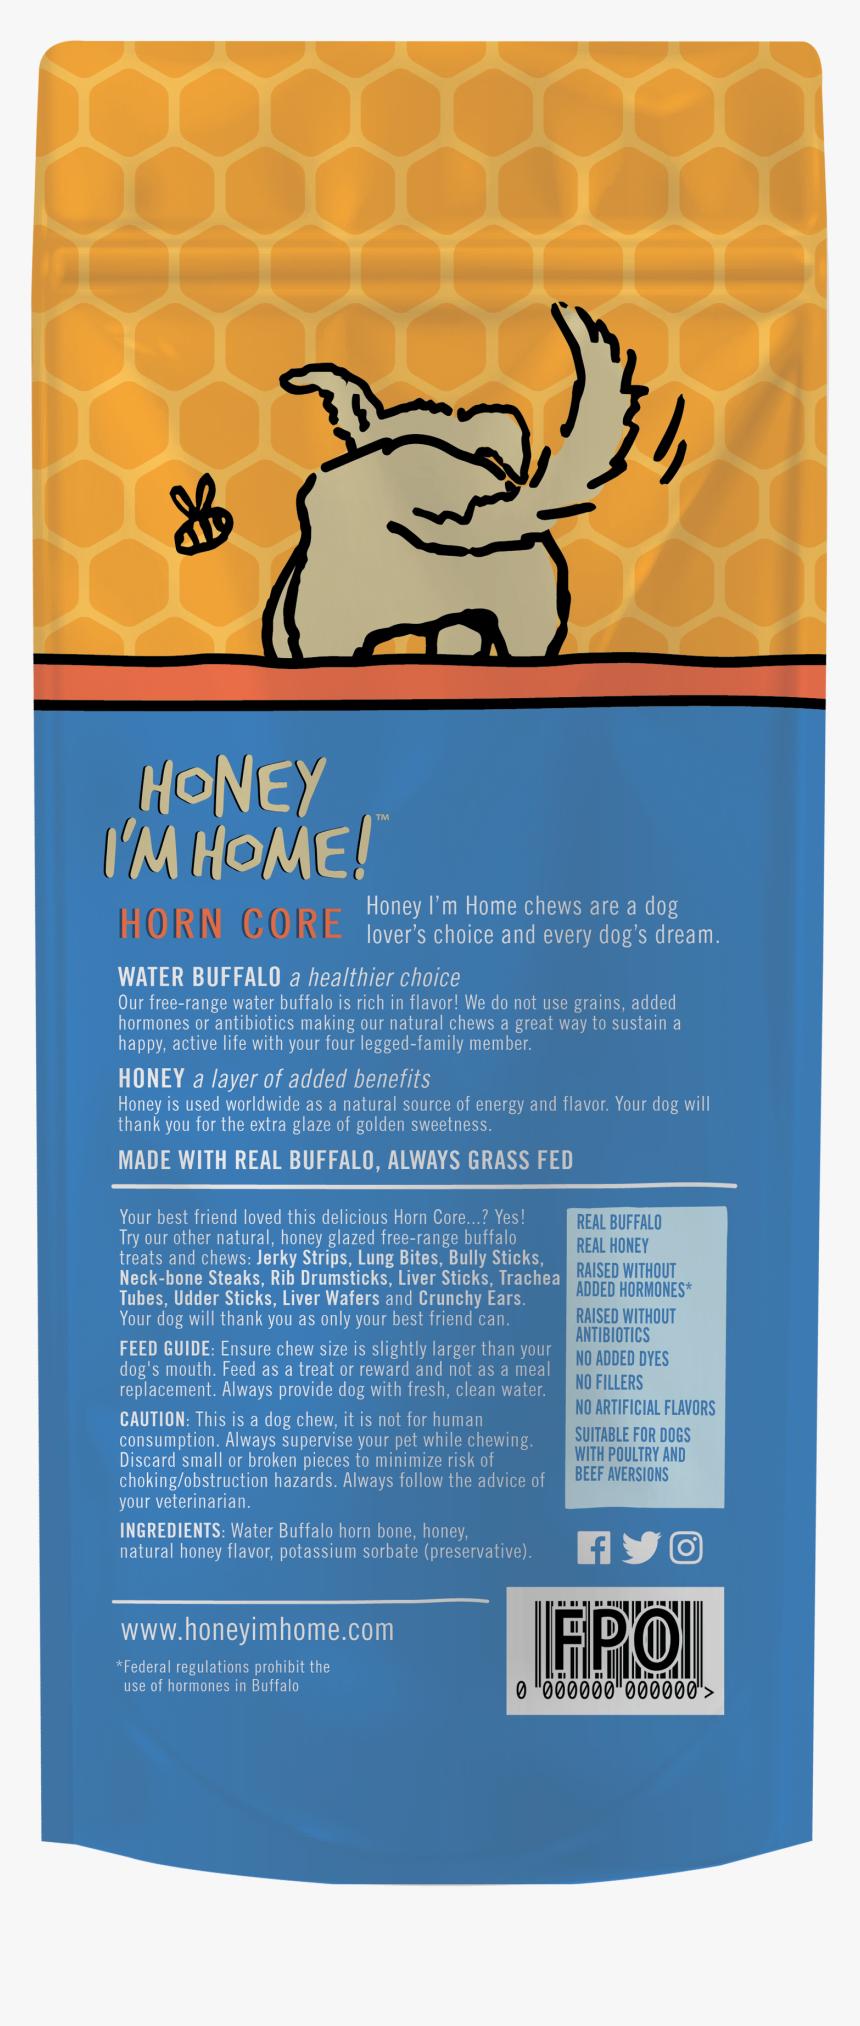 Indian Buffalo Png, Transparent Png, Free Download